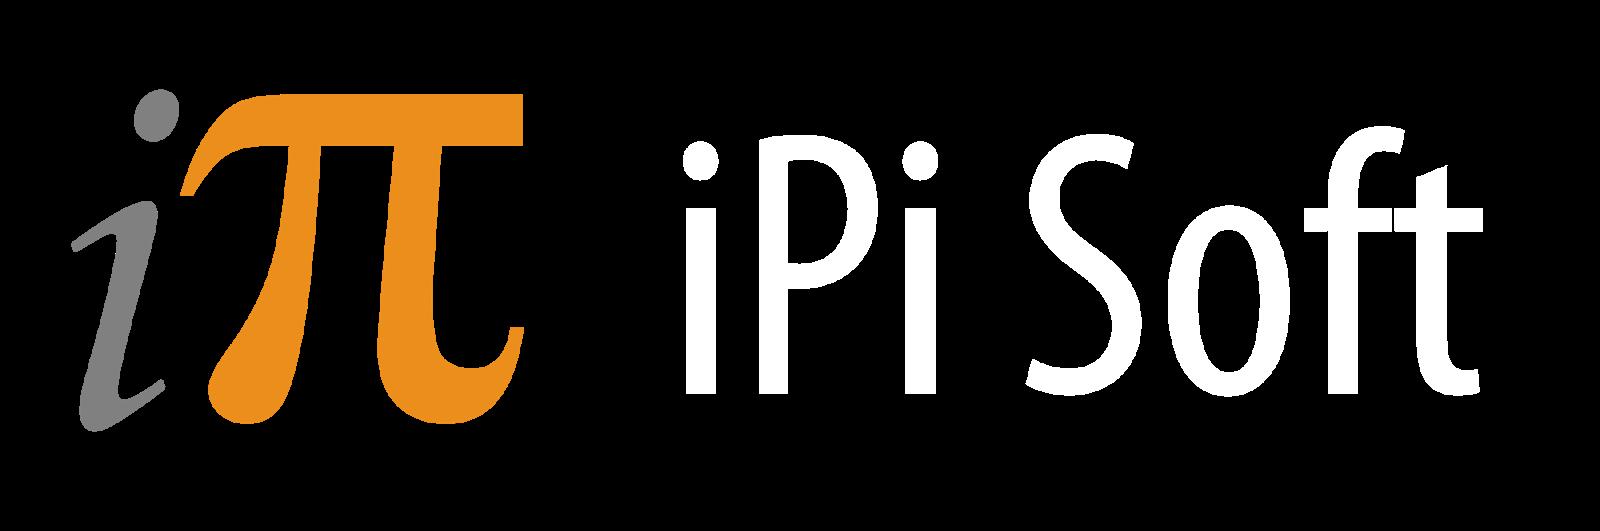 Co-patrocinadore